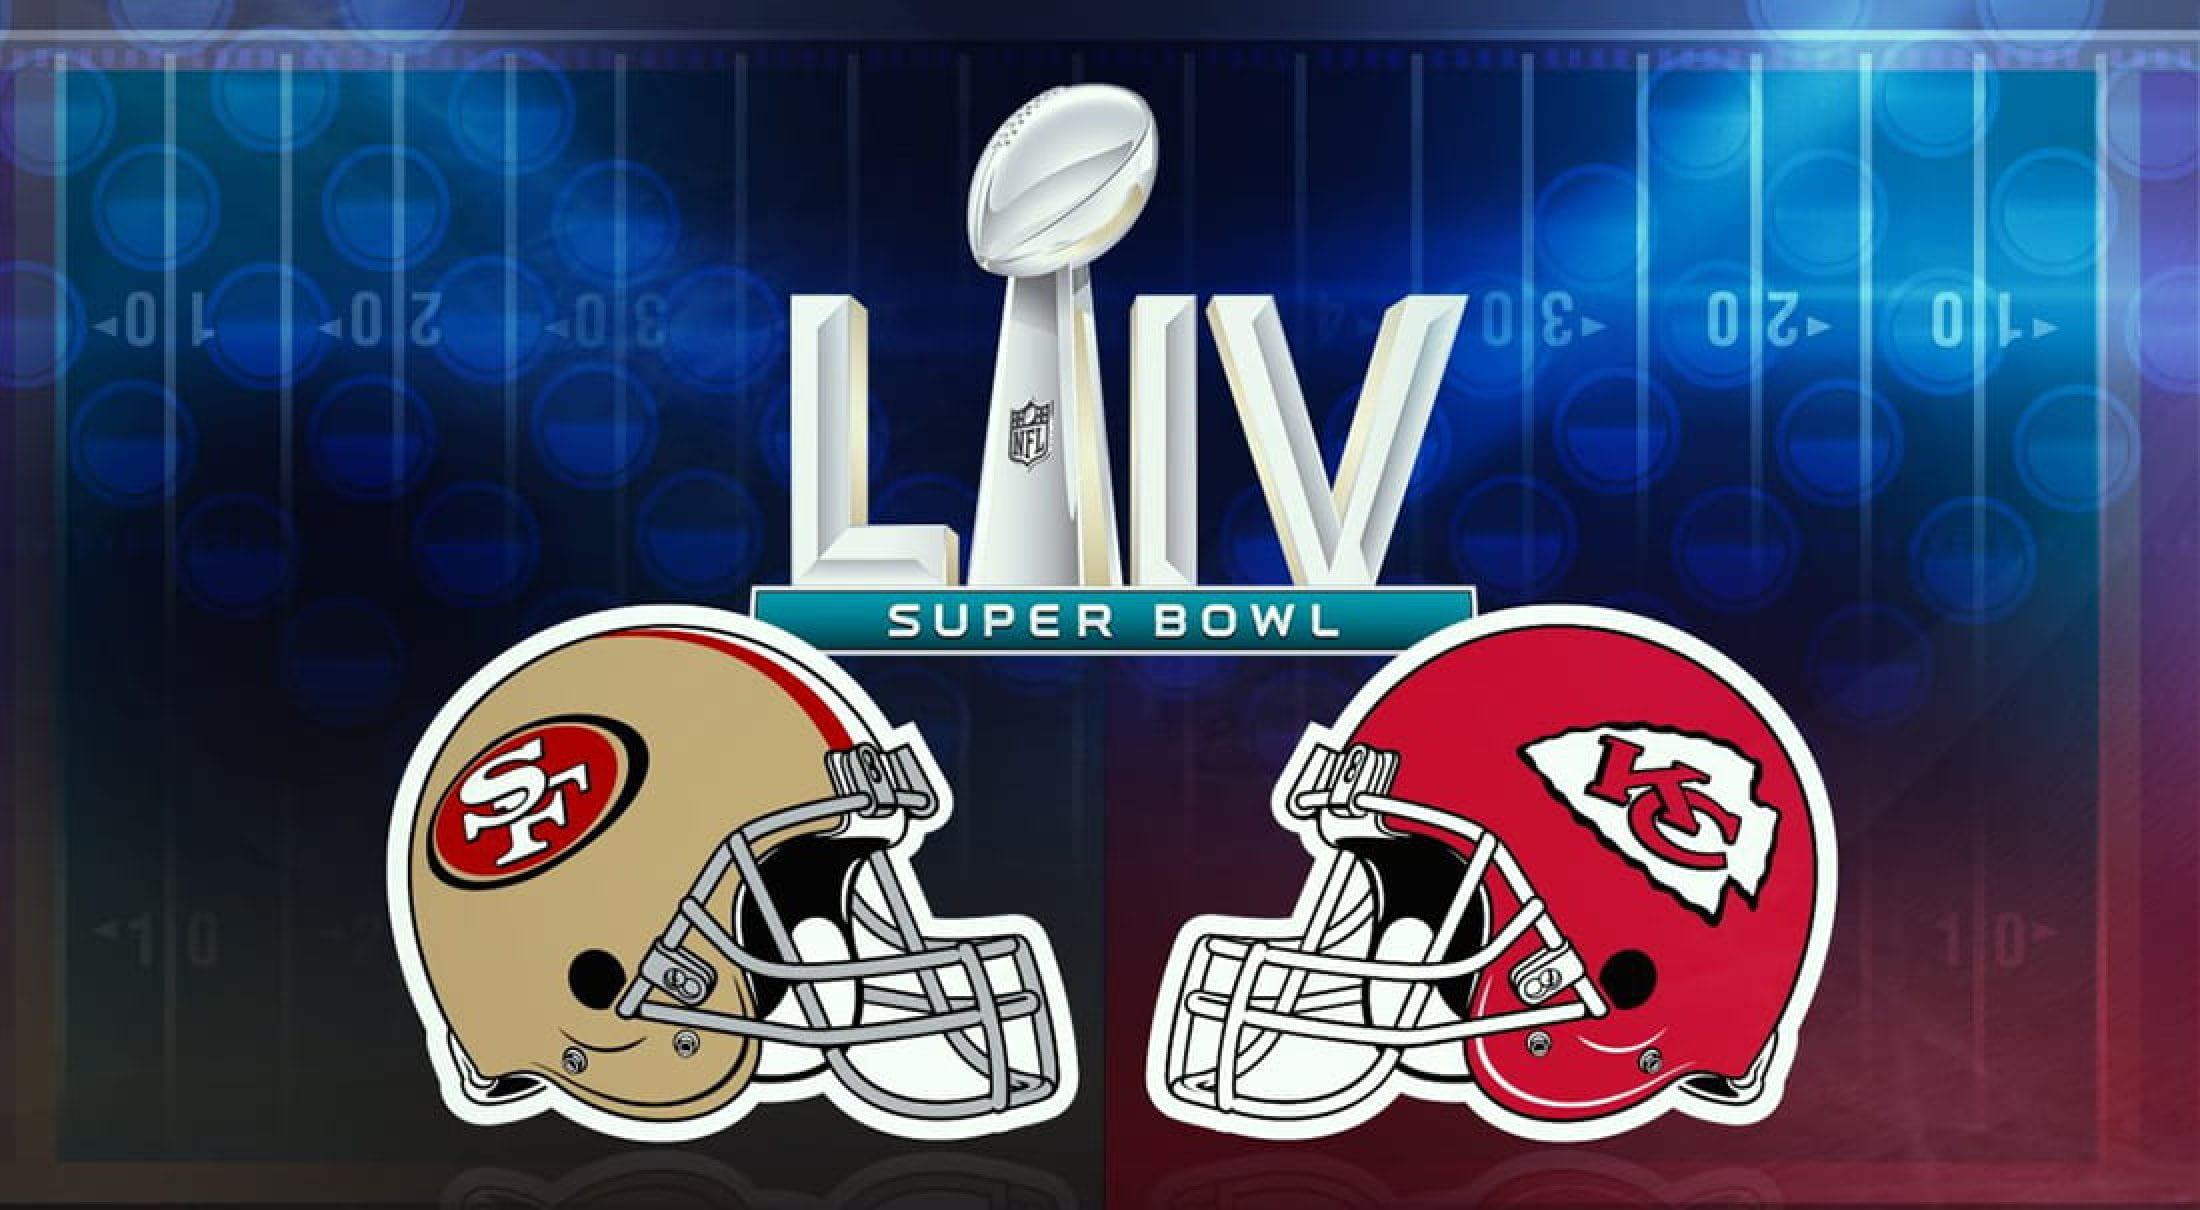 Super Bowl LIV